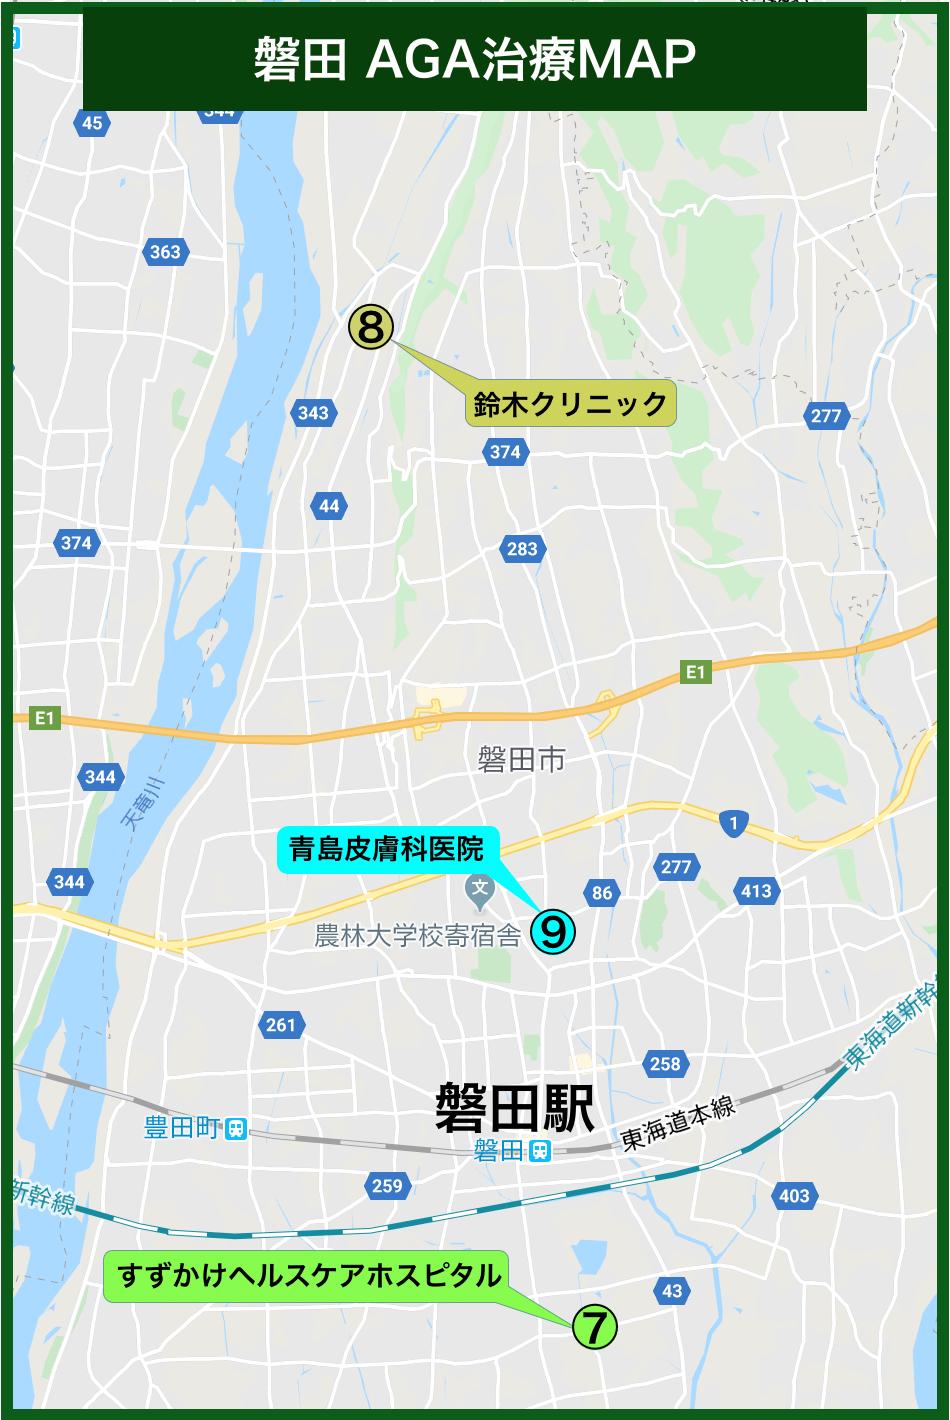 磐田 AGA治療MAP